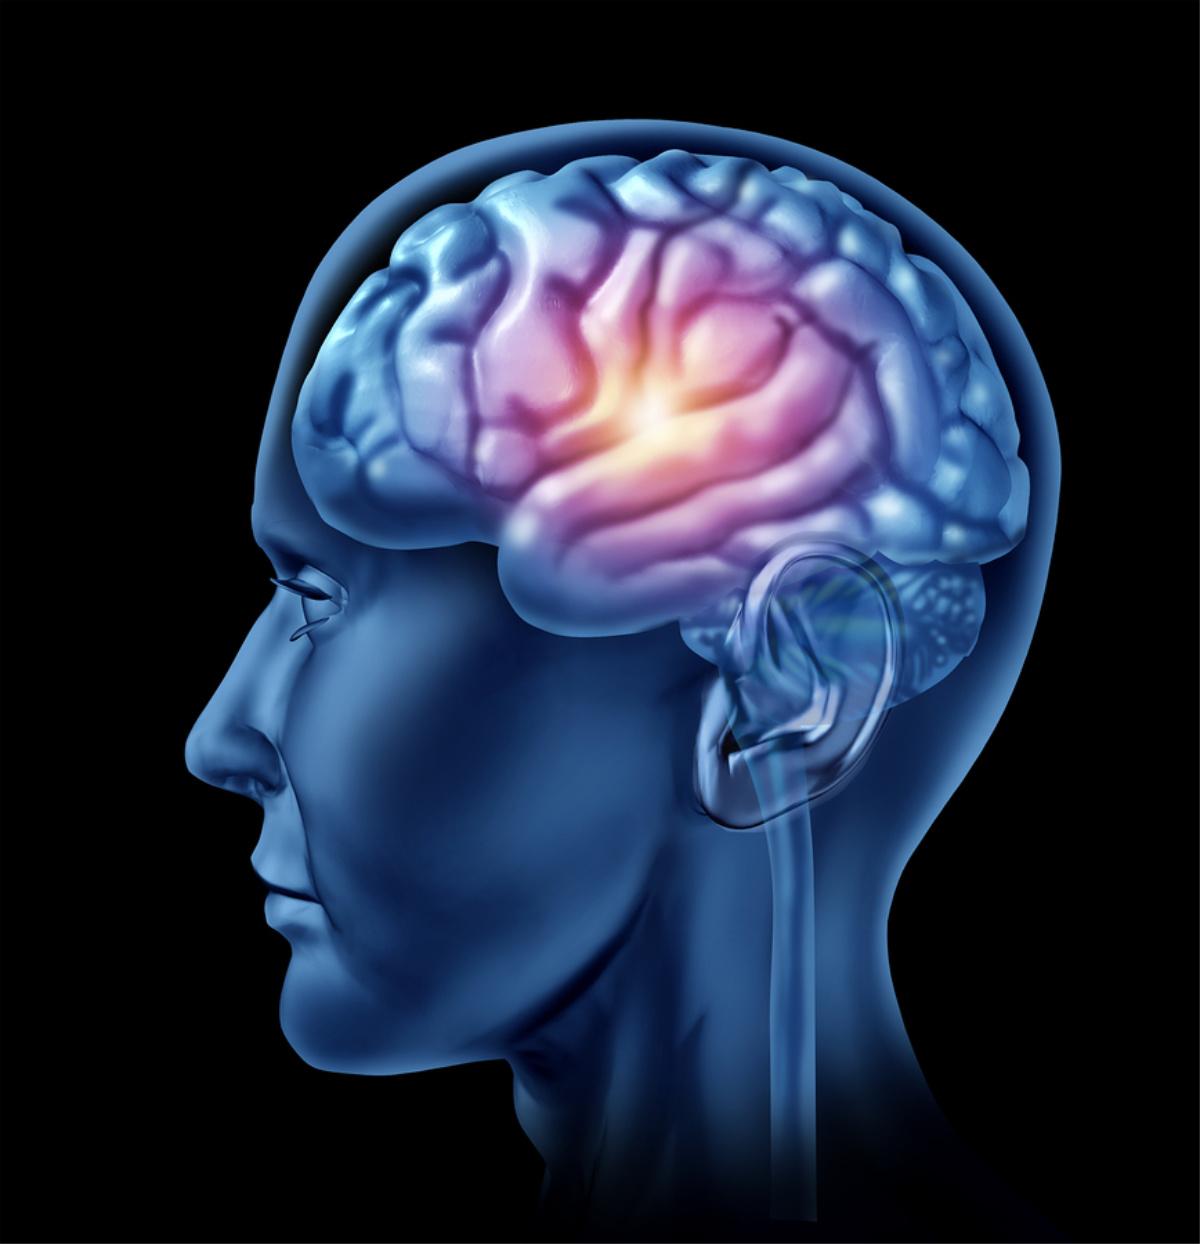 Homecare in Avondale AZ: Effects of Dementia Stigma